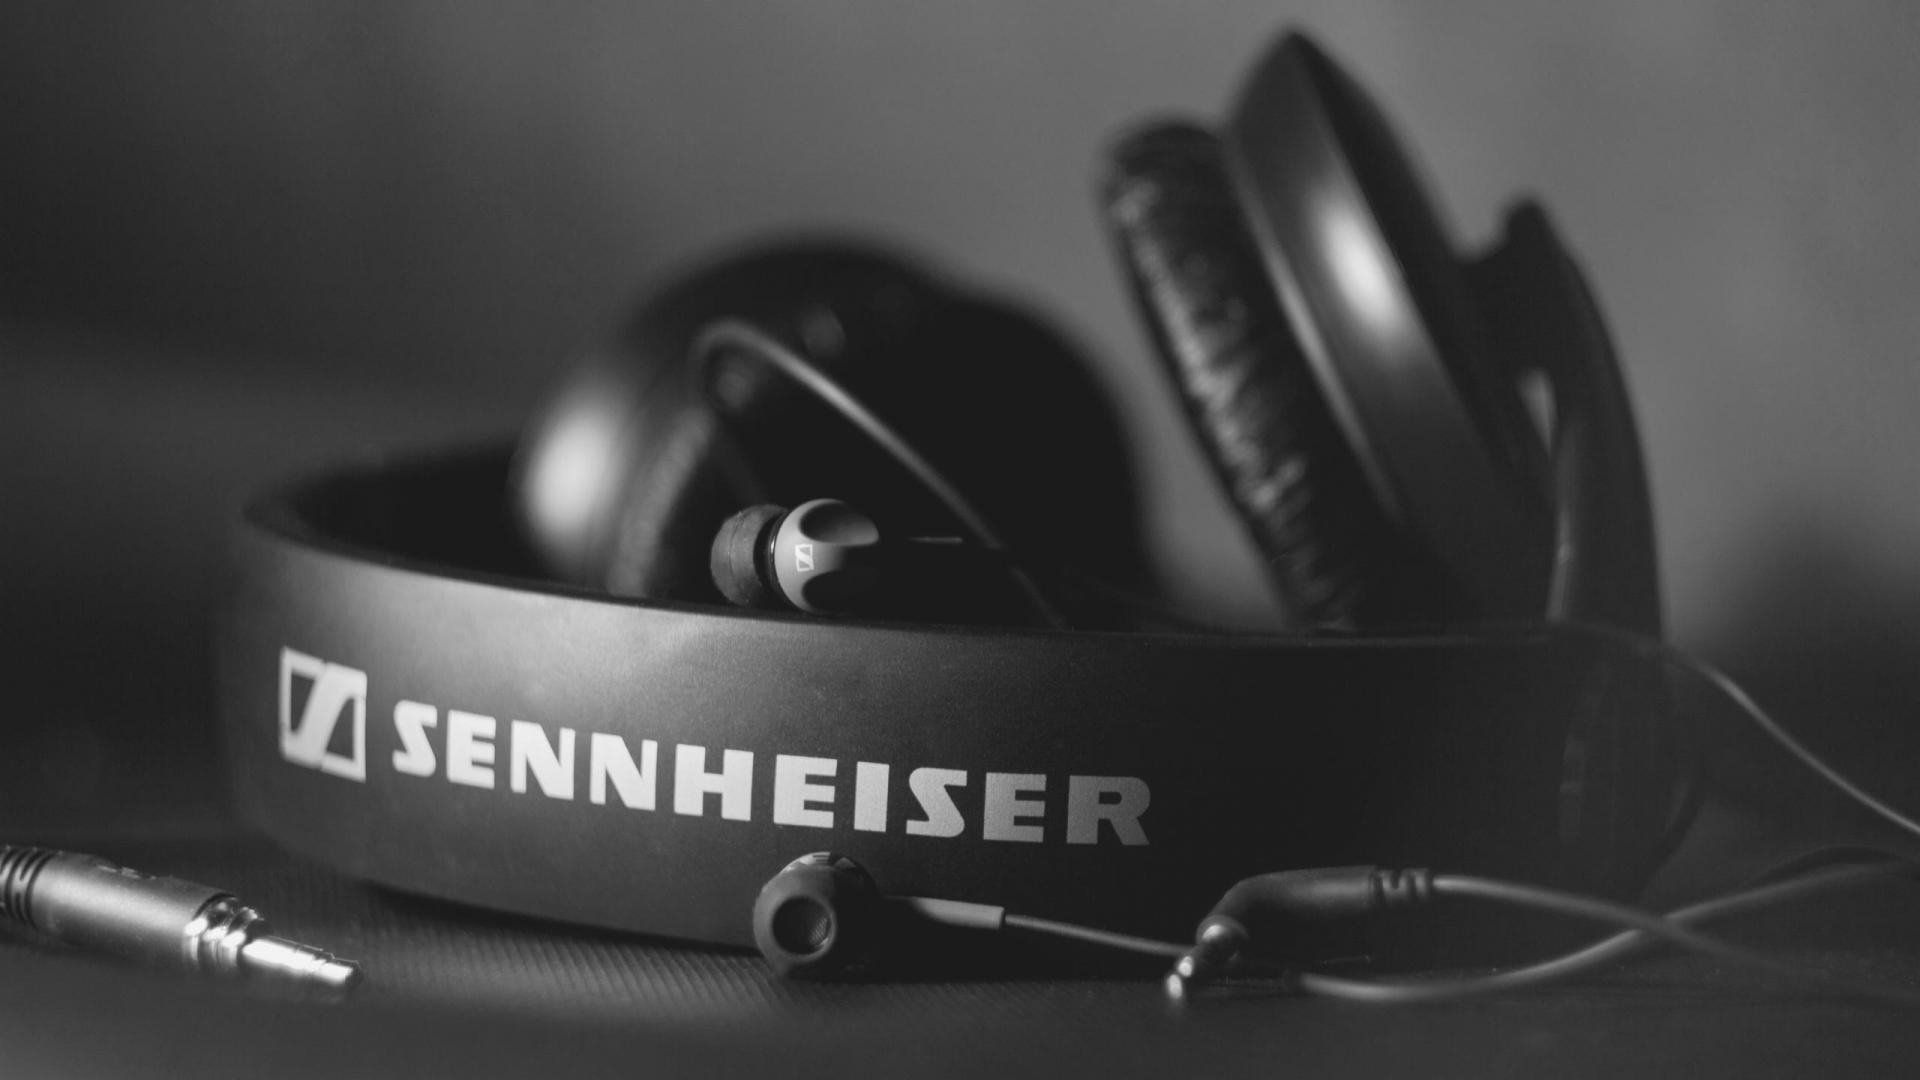 Sennheiser-Headphones-1080x1920.jpeg